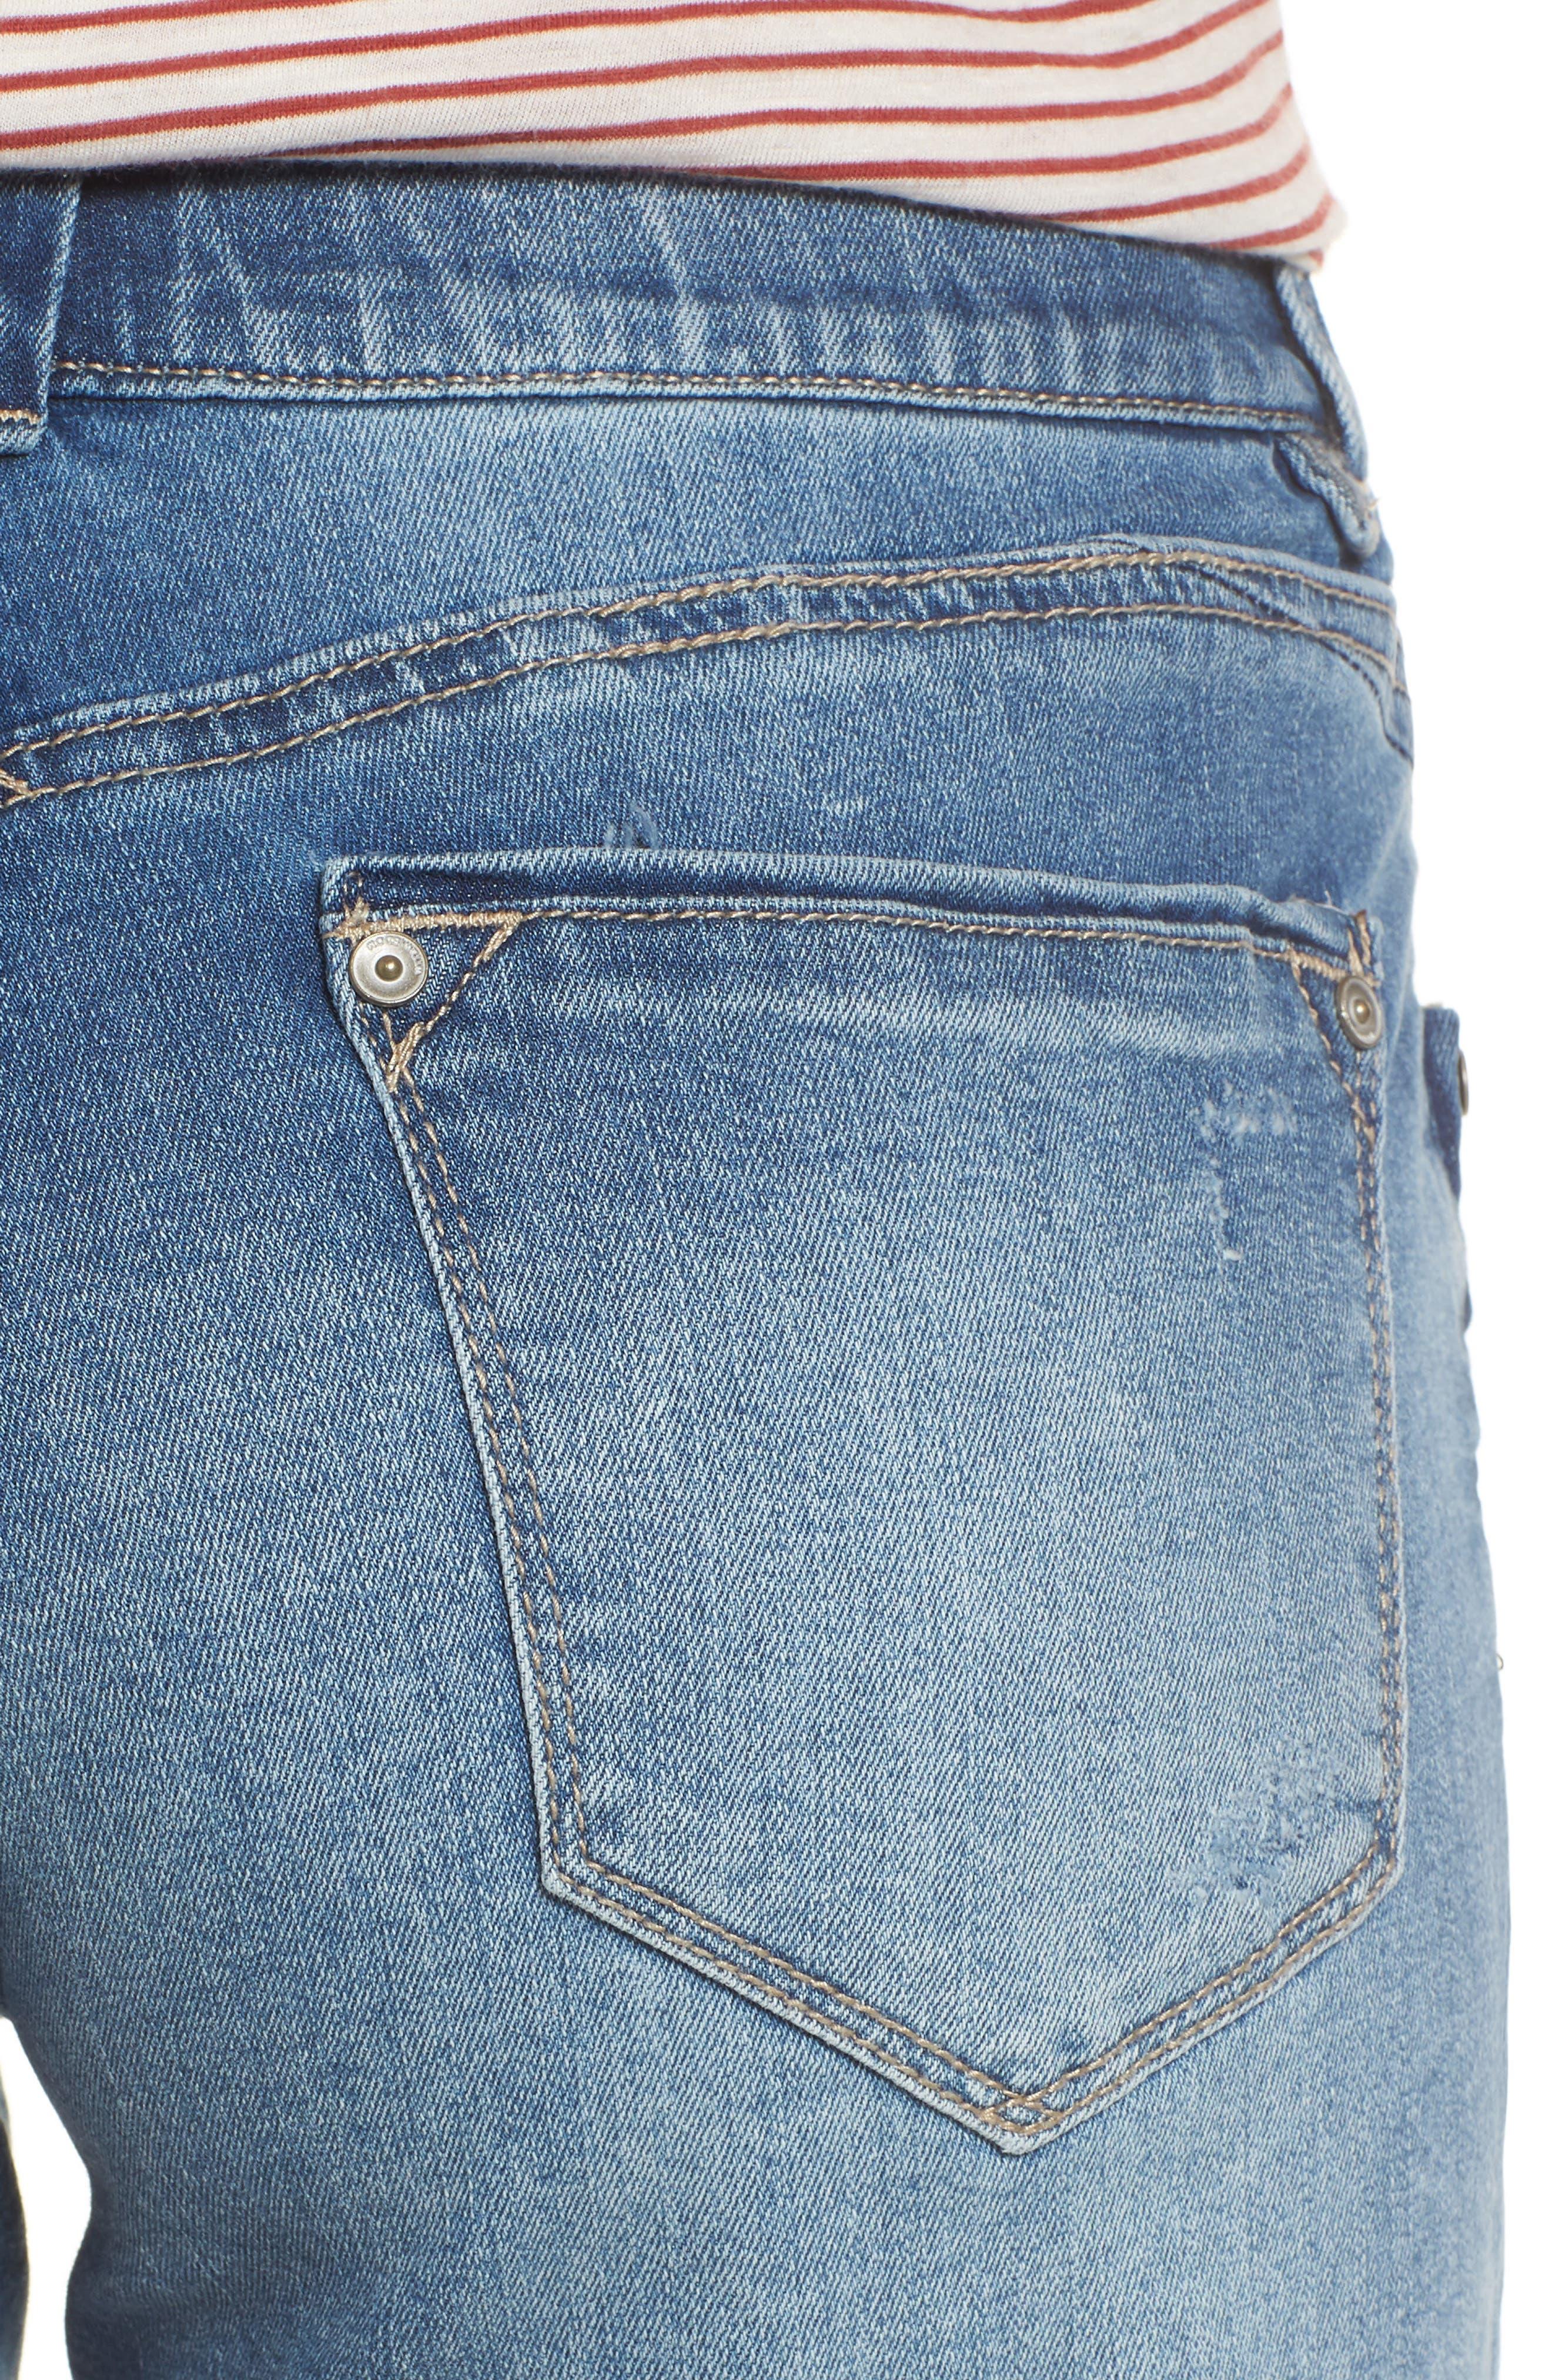 Ab-solution Denim Shorts,                             Alternate thumbnail 4, color,                             458